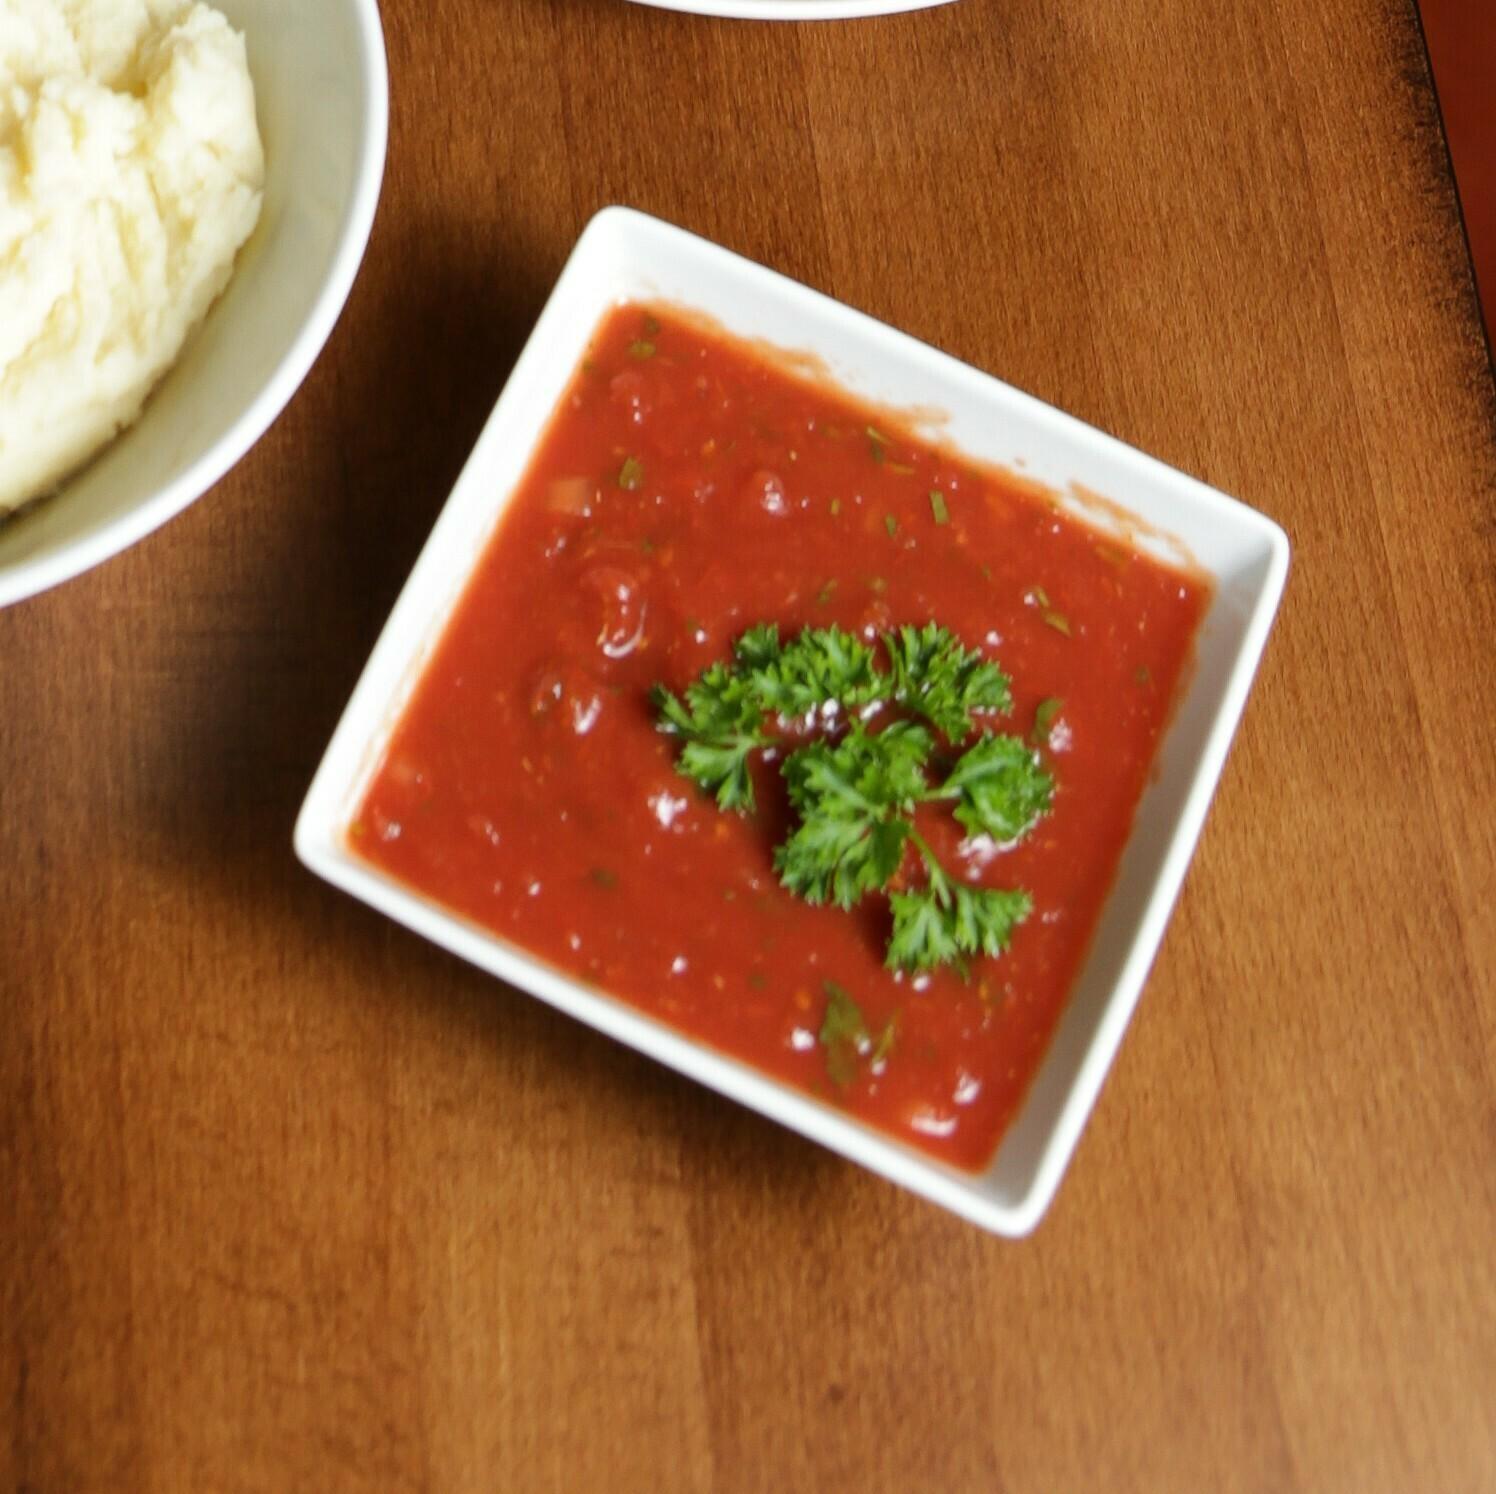 Sauces - Salsa (12 oz)